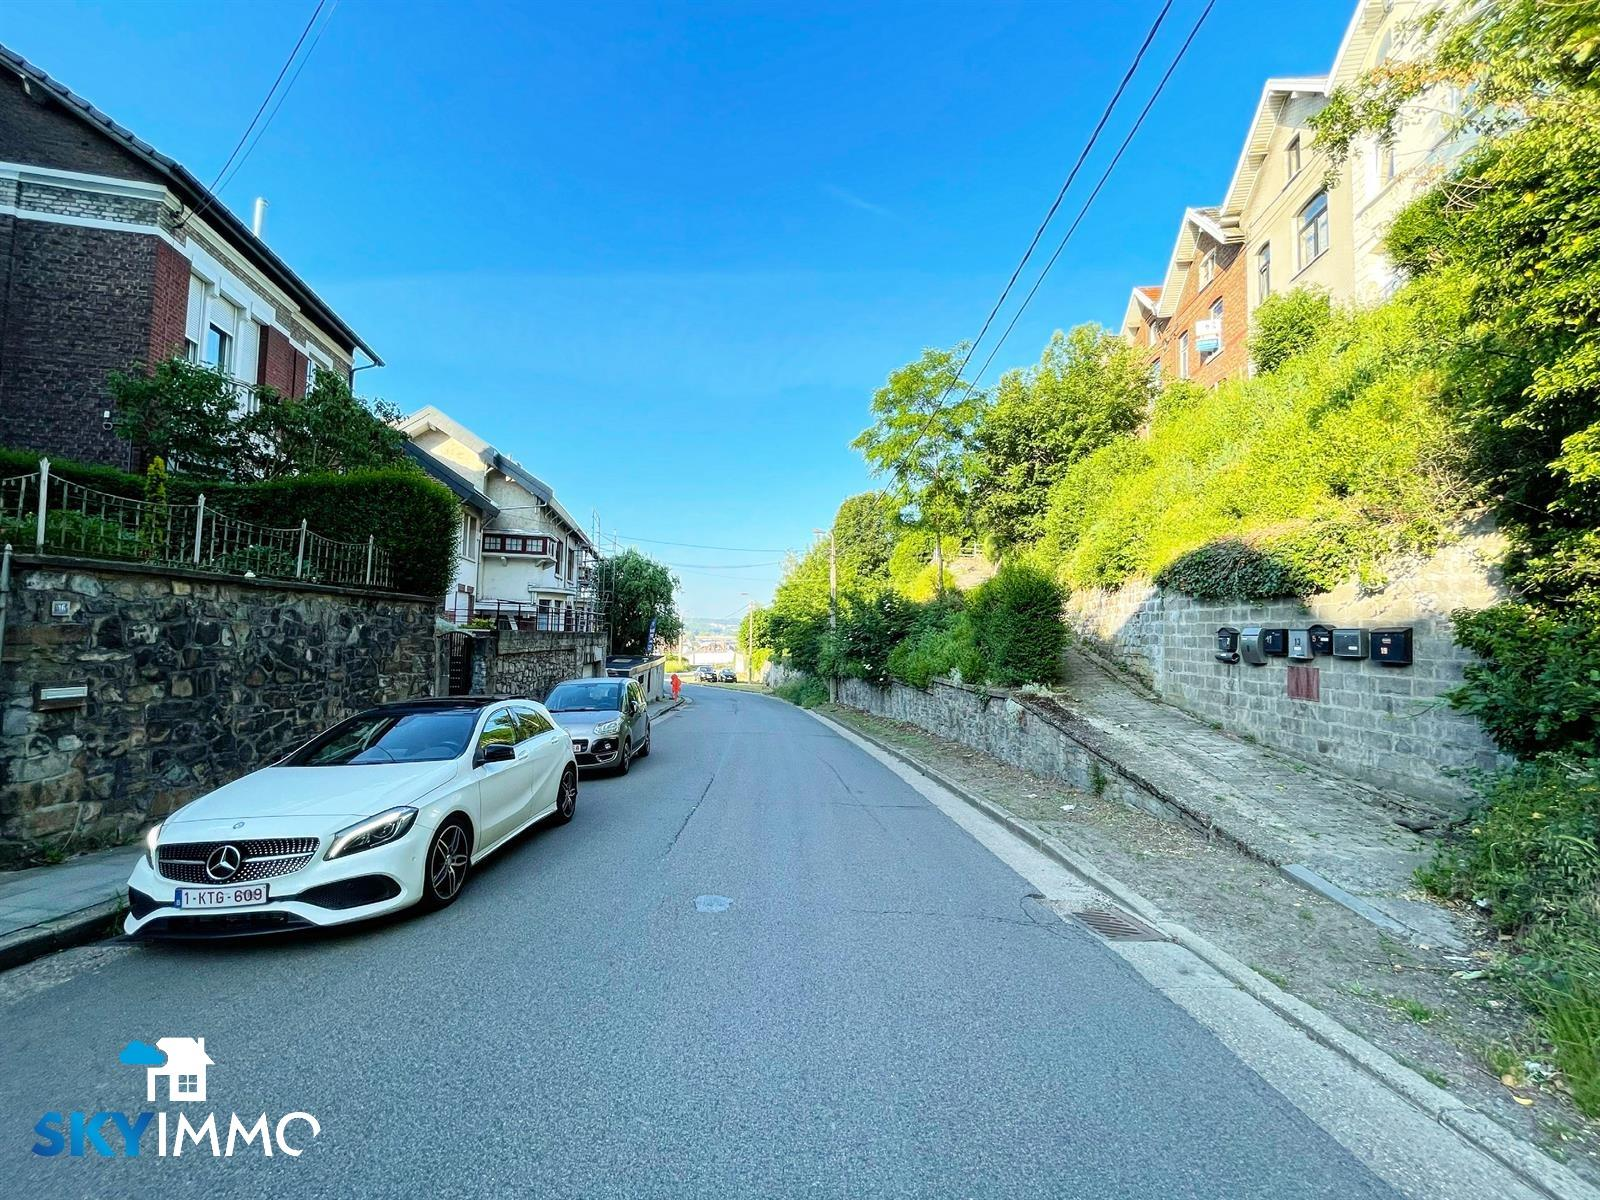 Maison - Seraing Jemeppesur-Meuse - #4383857-23